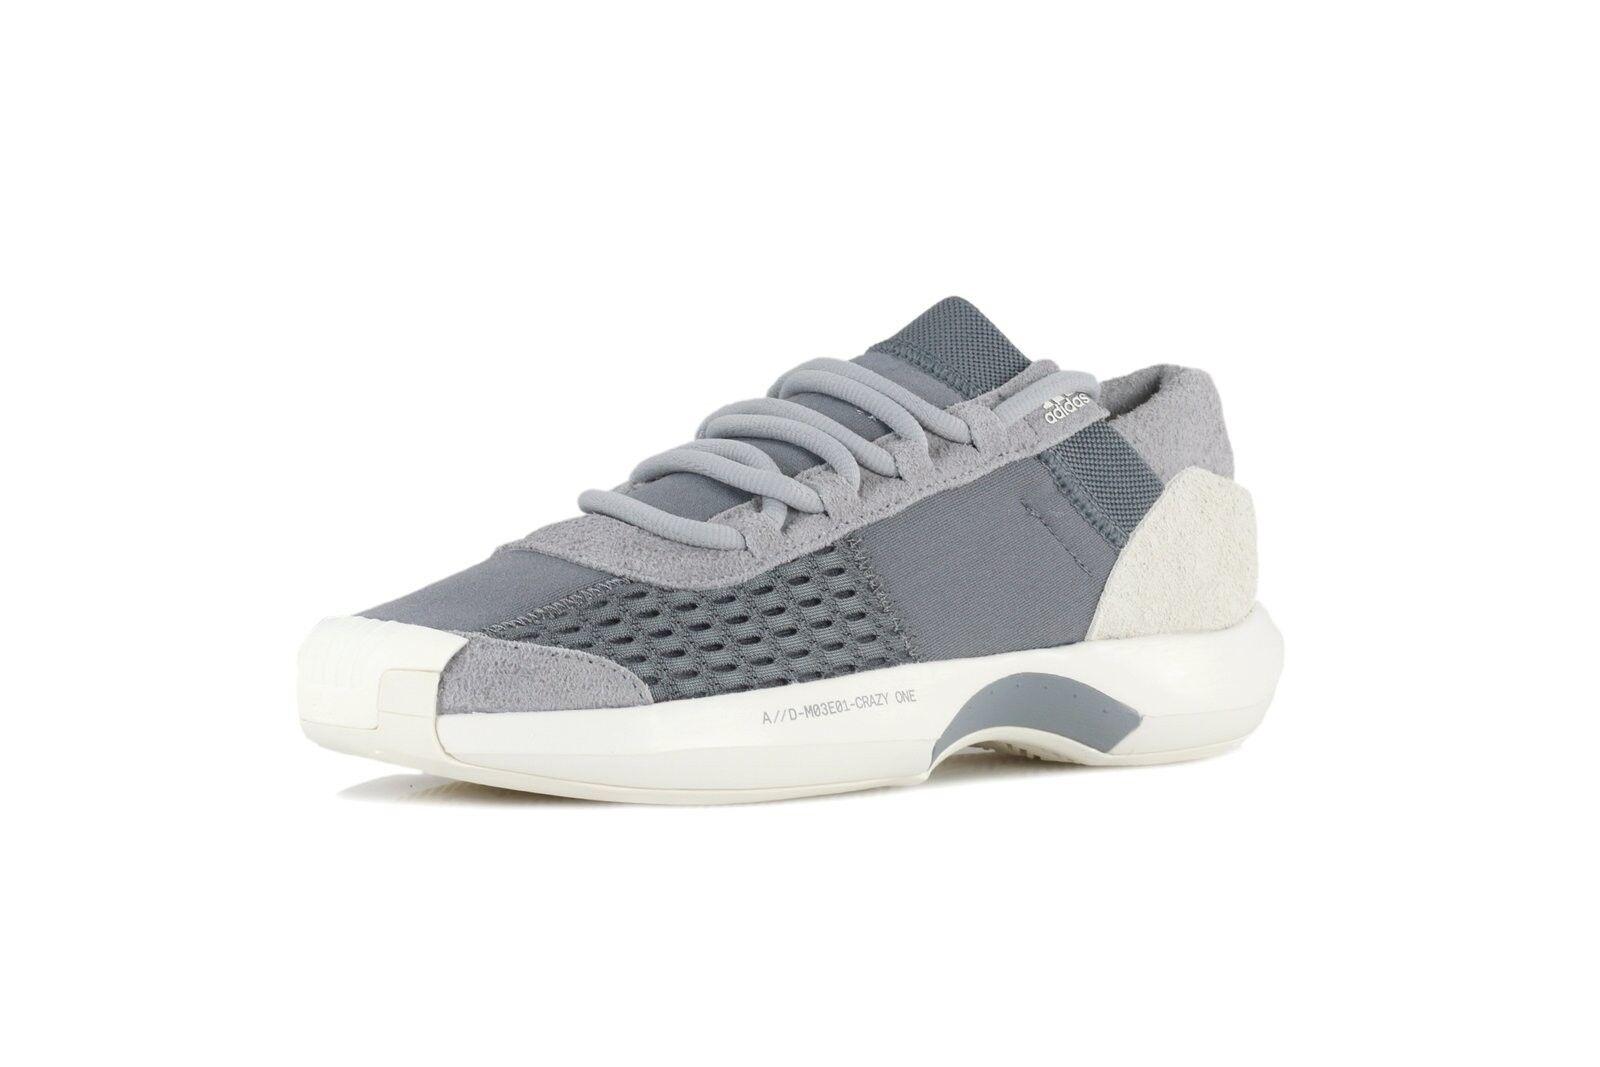 best sneakers 4b779 66a41 Adidas consorzio pazzo 1 10 rrr 159.99 £ £ £ avanzati 4d851f